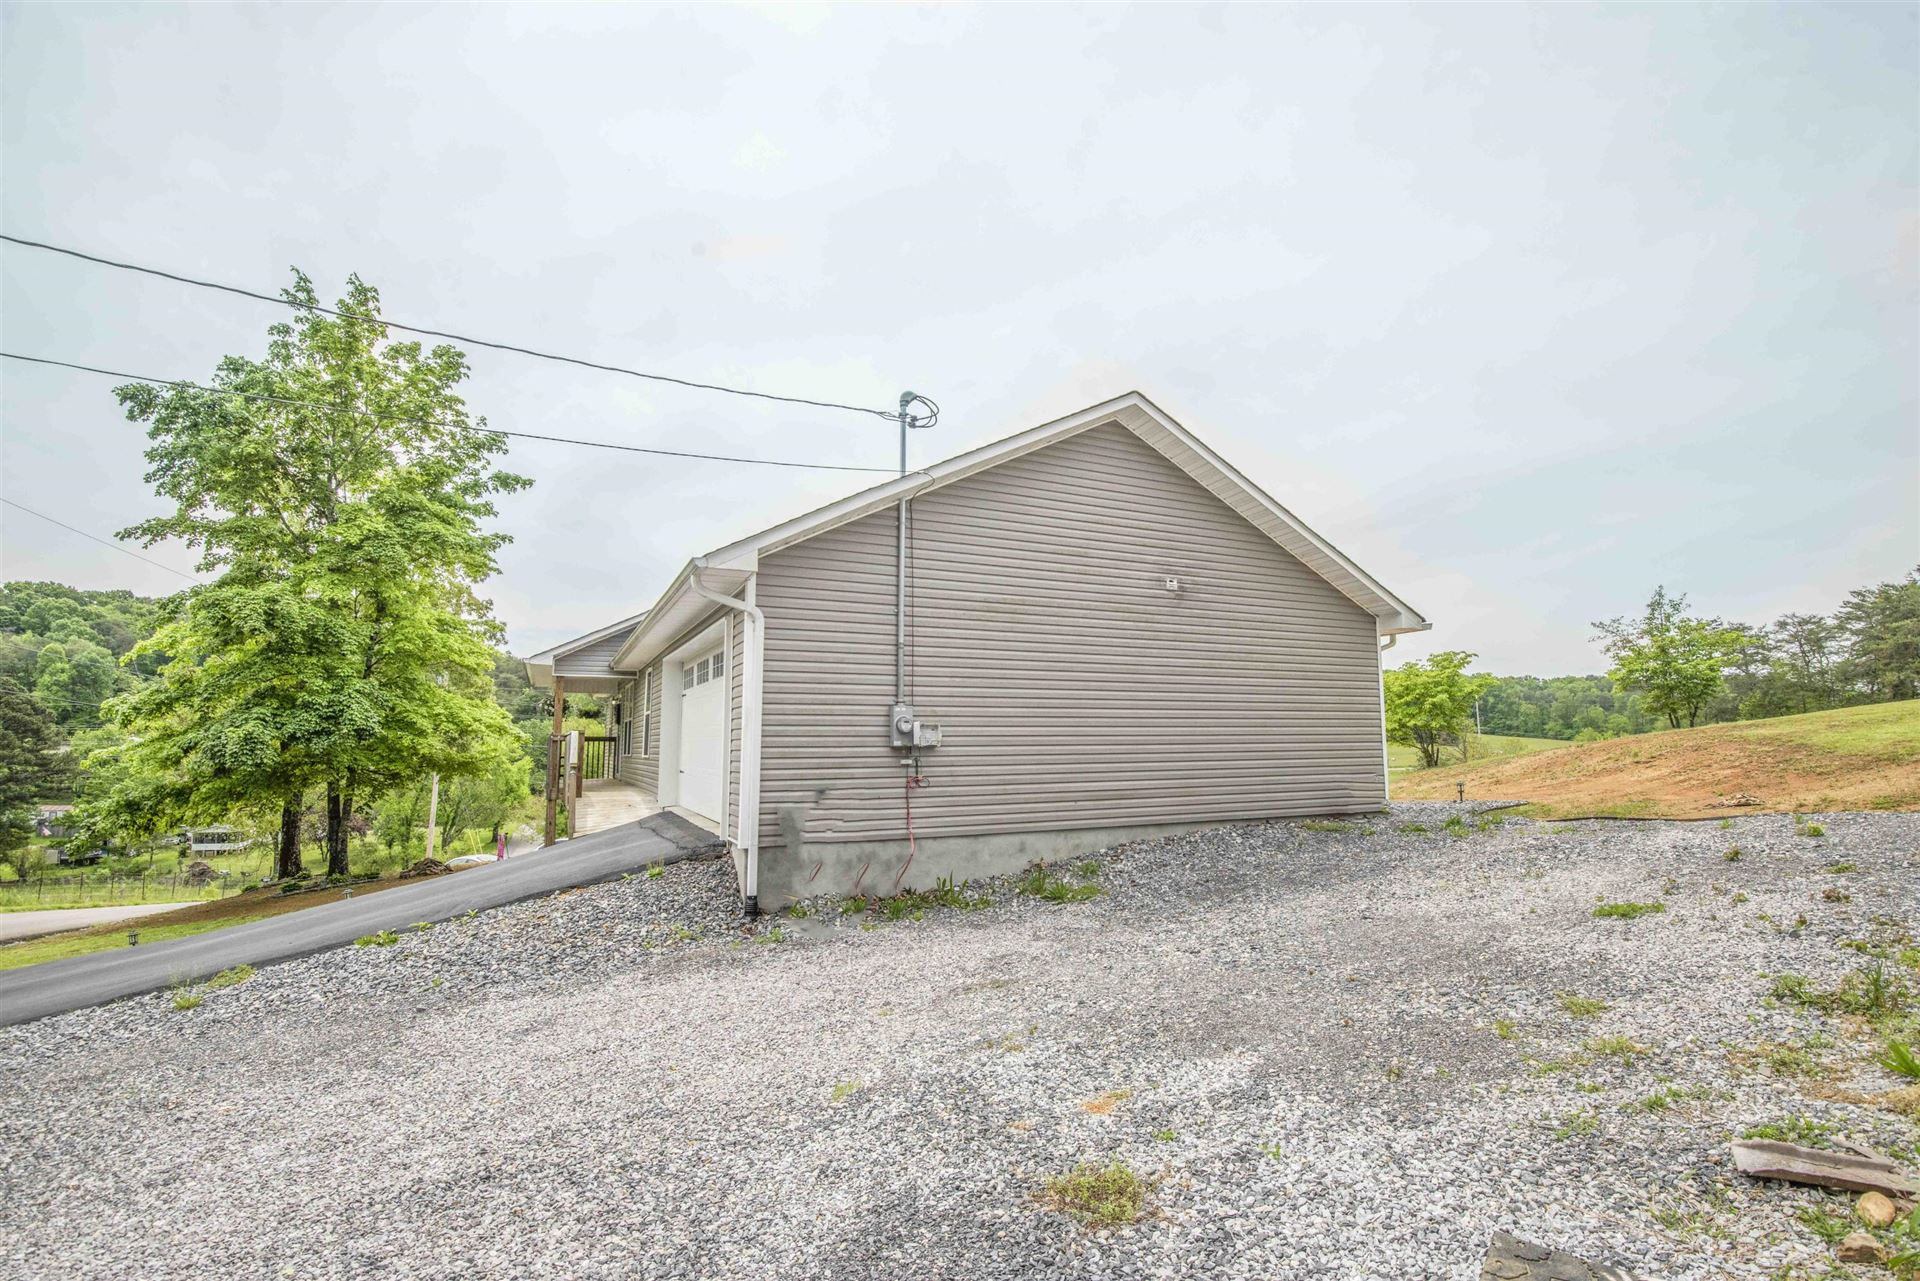 Photo of 1747 Dinkins Road, Seymour, TN 37865 (MLS # 1152496)